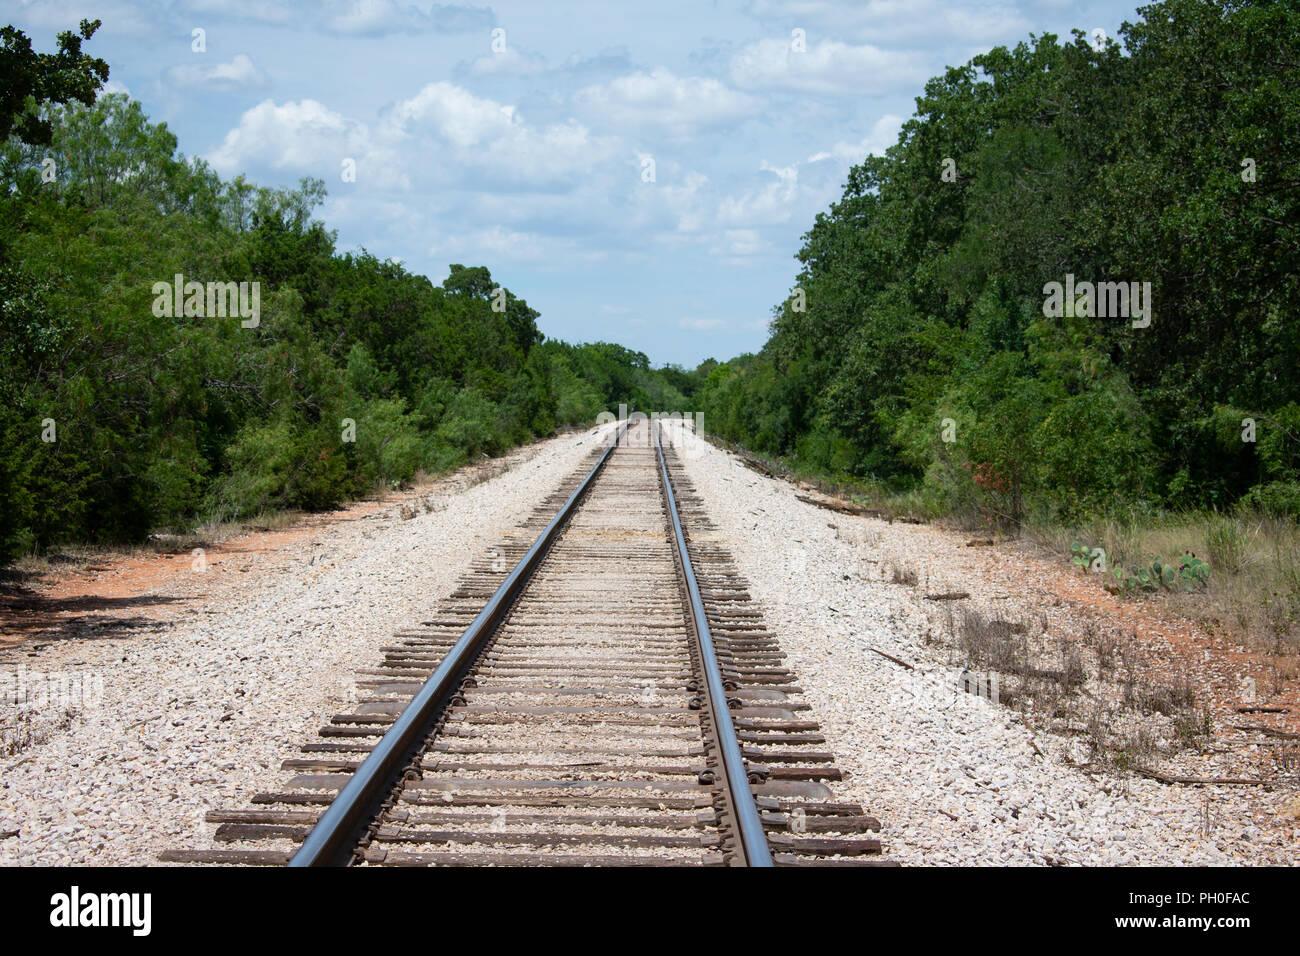 North Texas Rail History Stock Photos & North Texas Rail